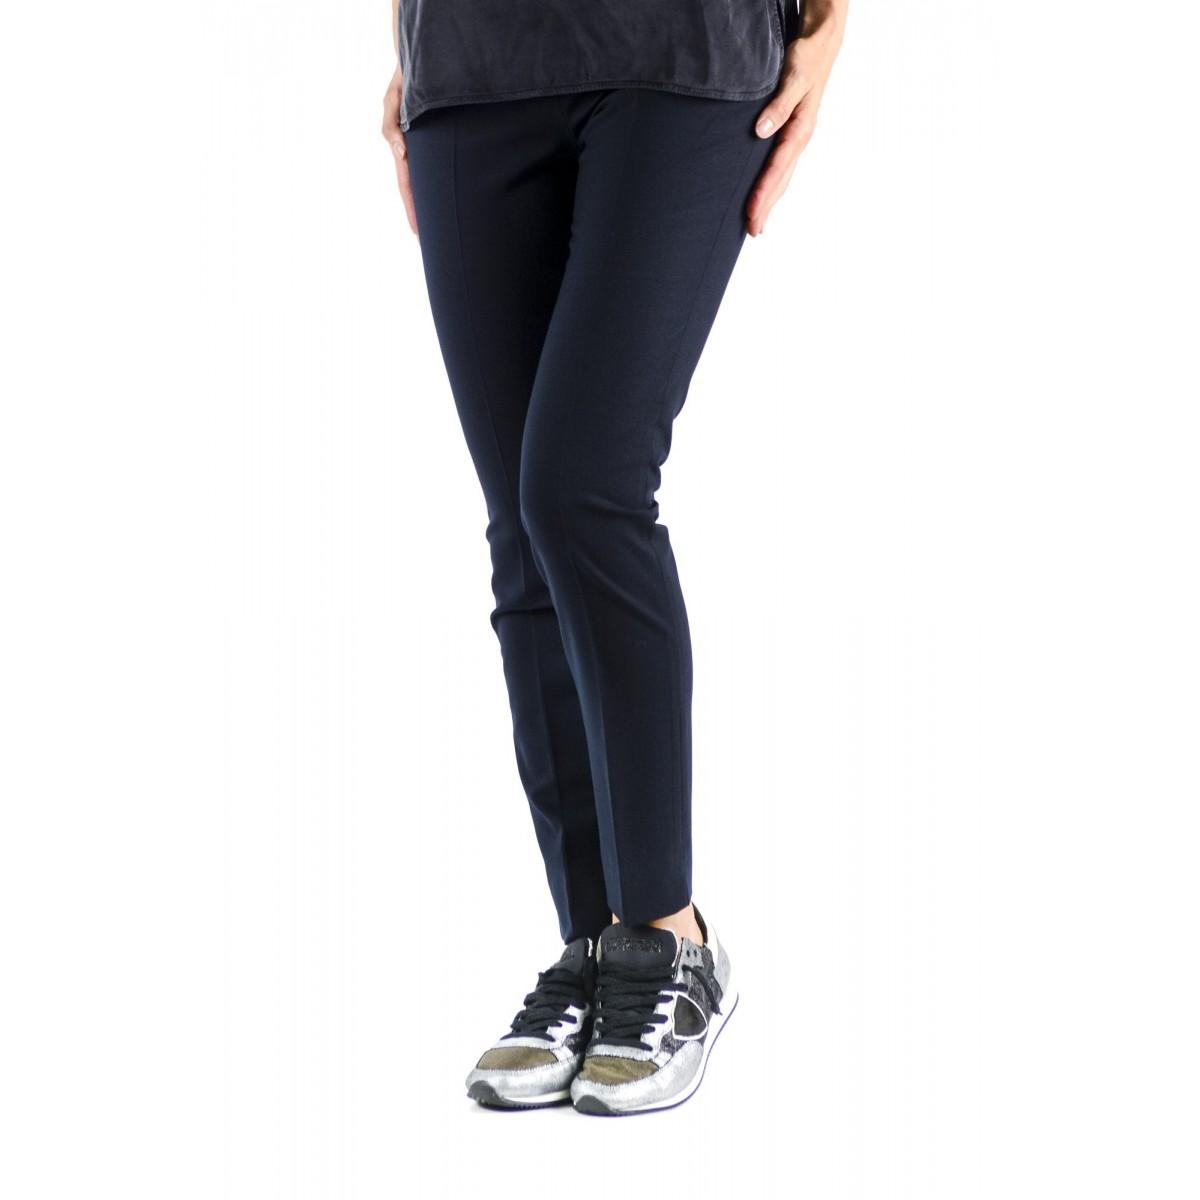 Pantalone donna Incotex - 171499 d1149 arlet flanella lana 820 - Blu